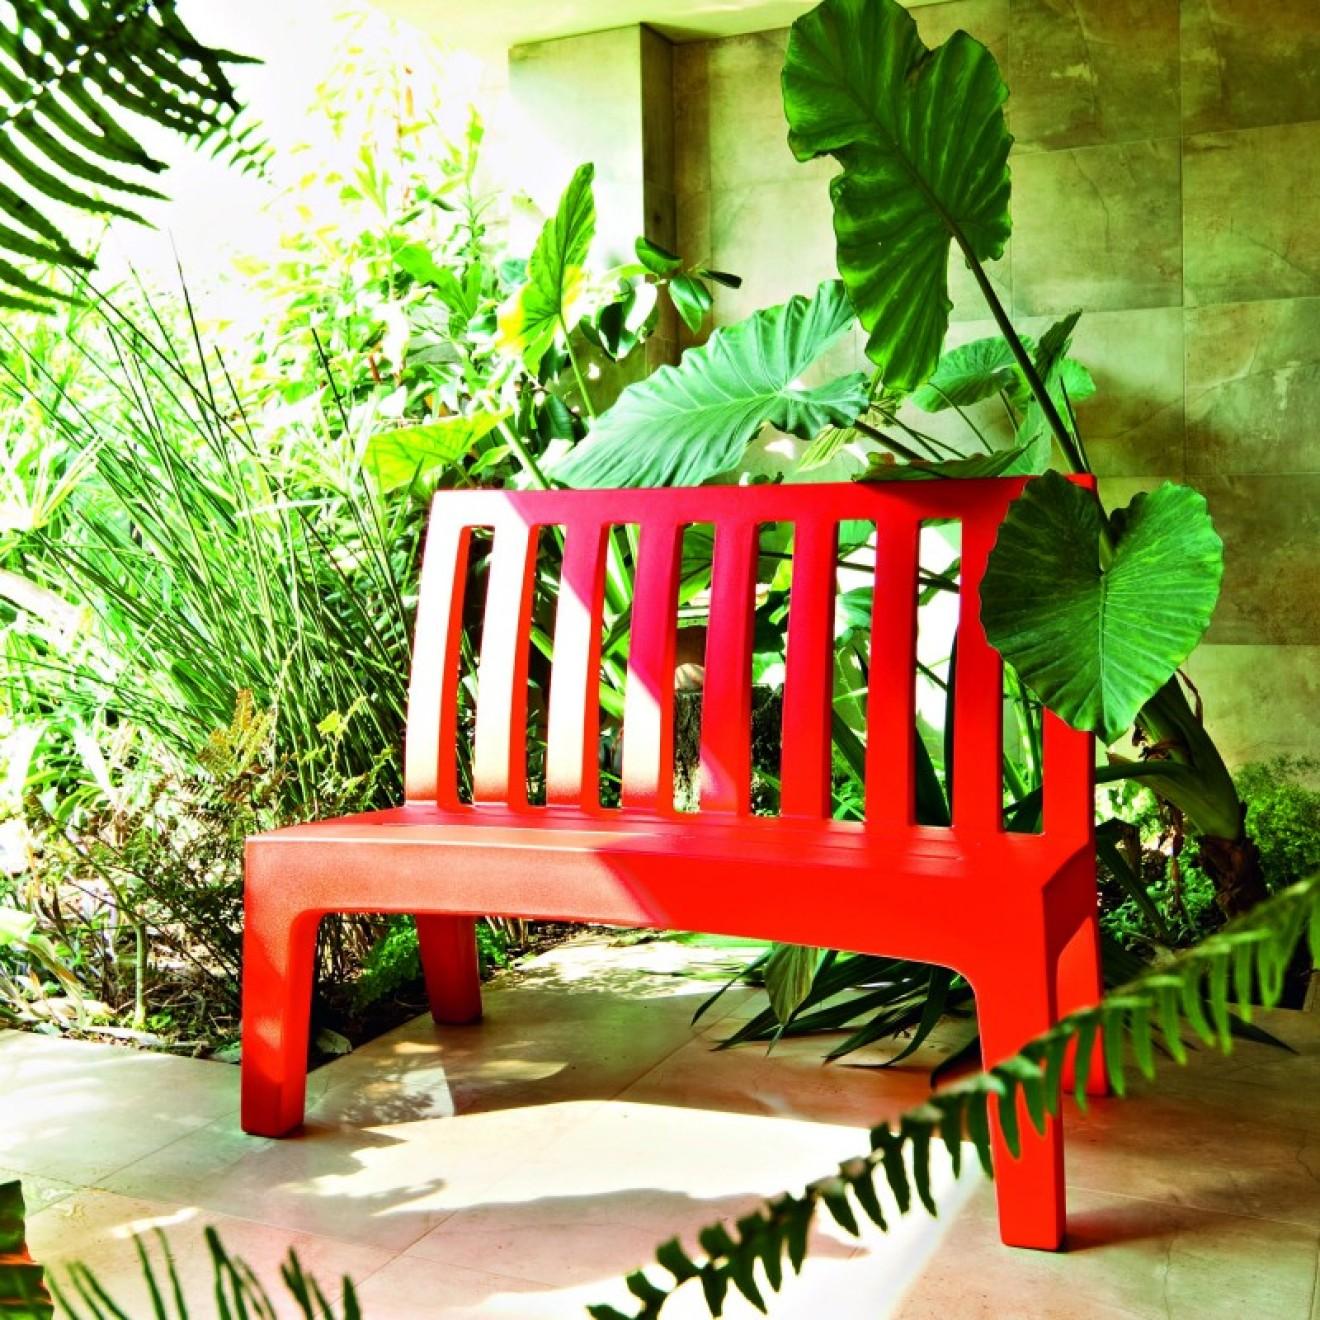 serralunga. Black Bedroom Furniture Sets. Home Design Ideas